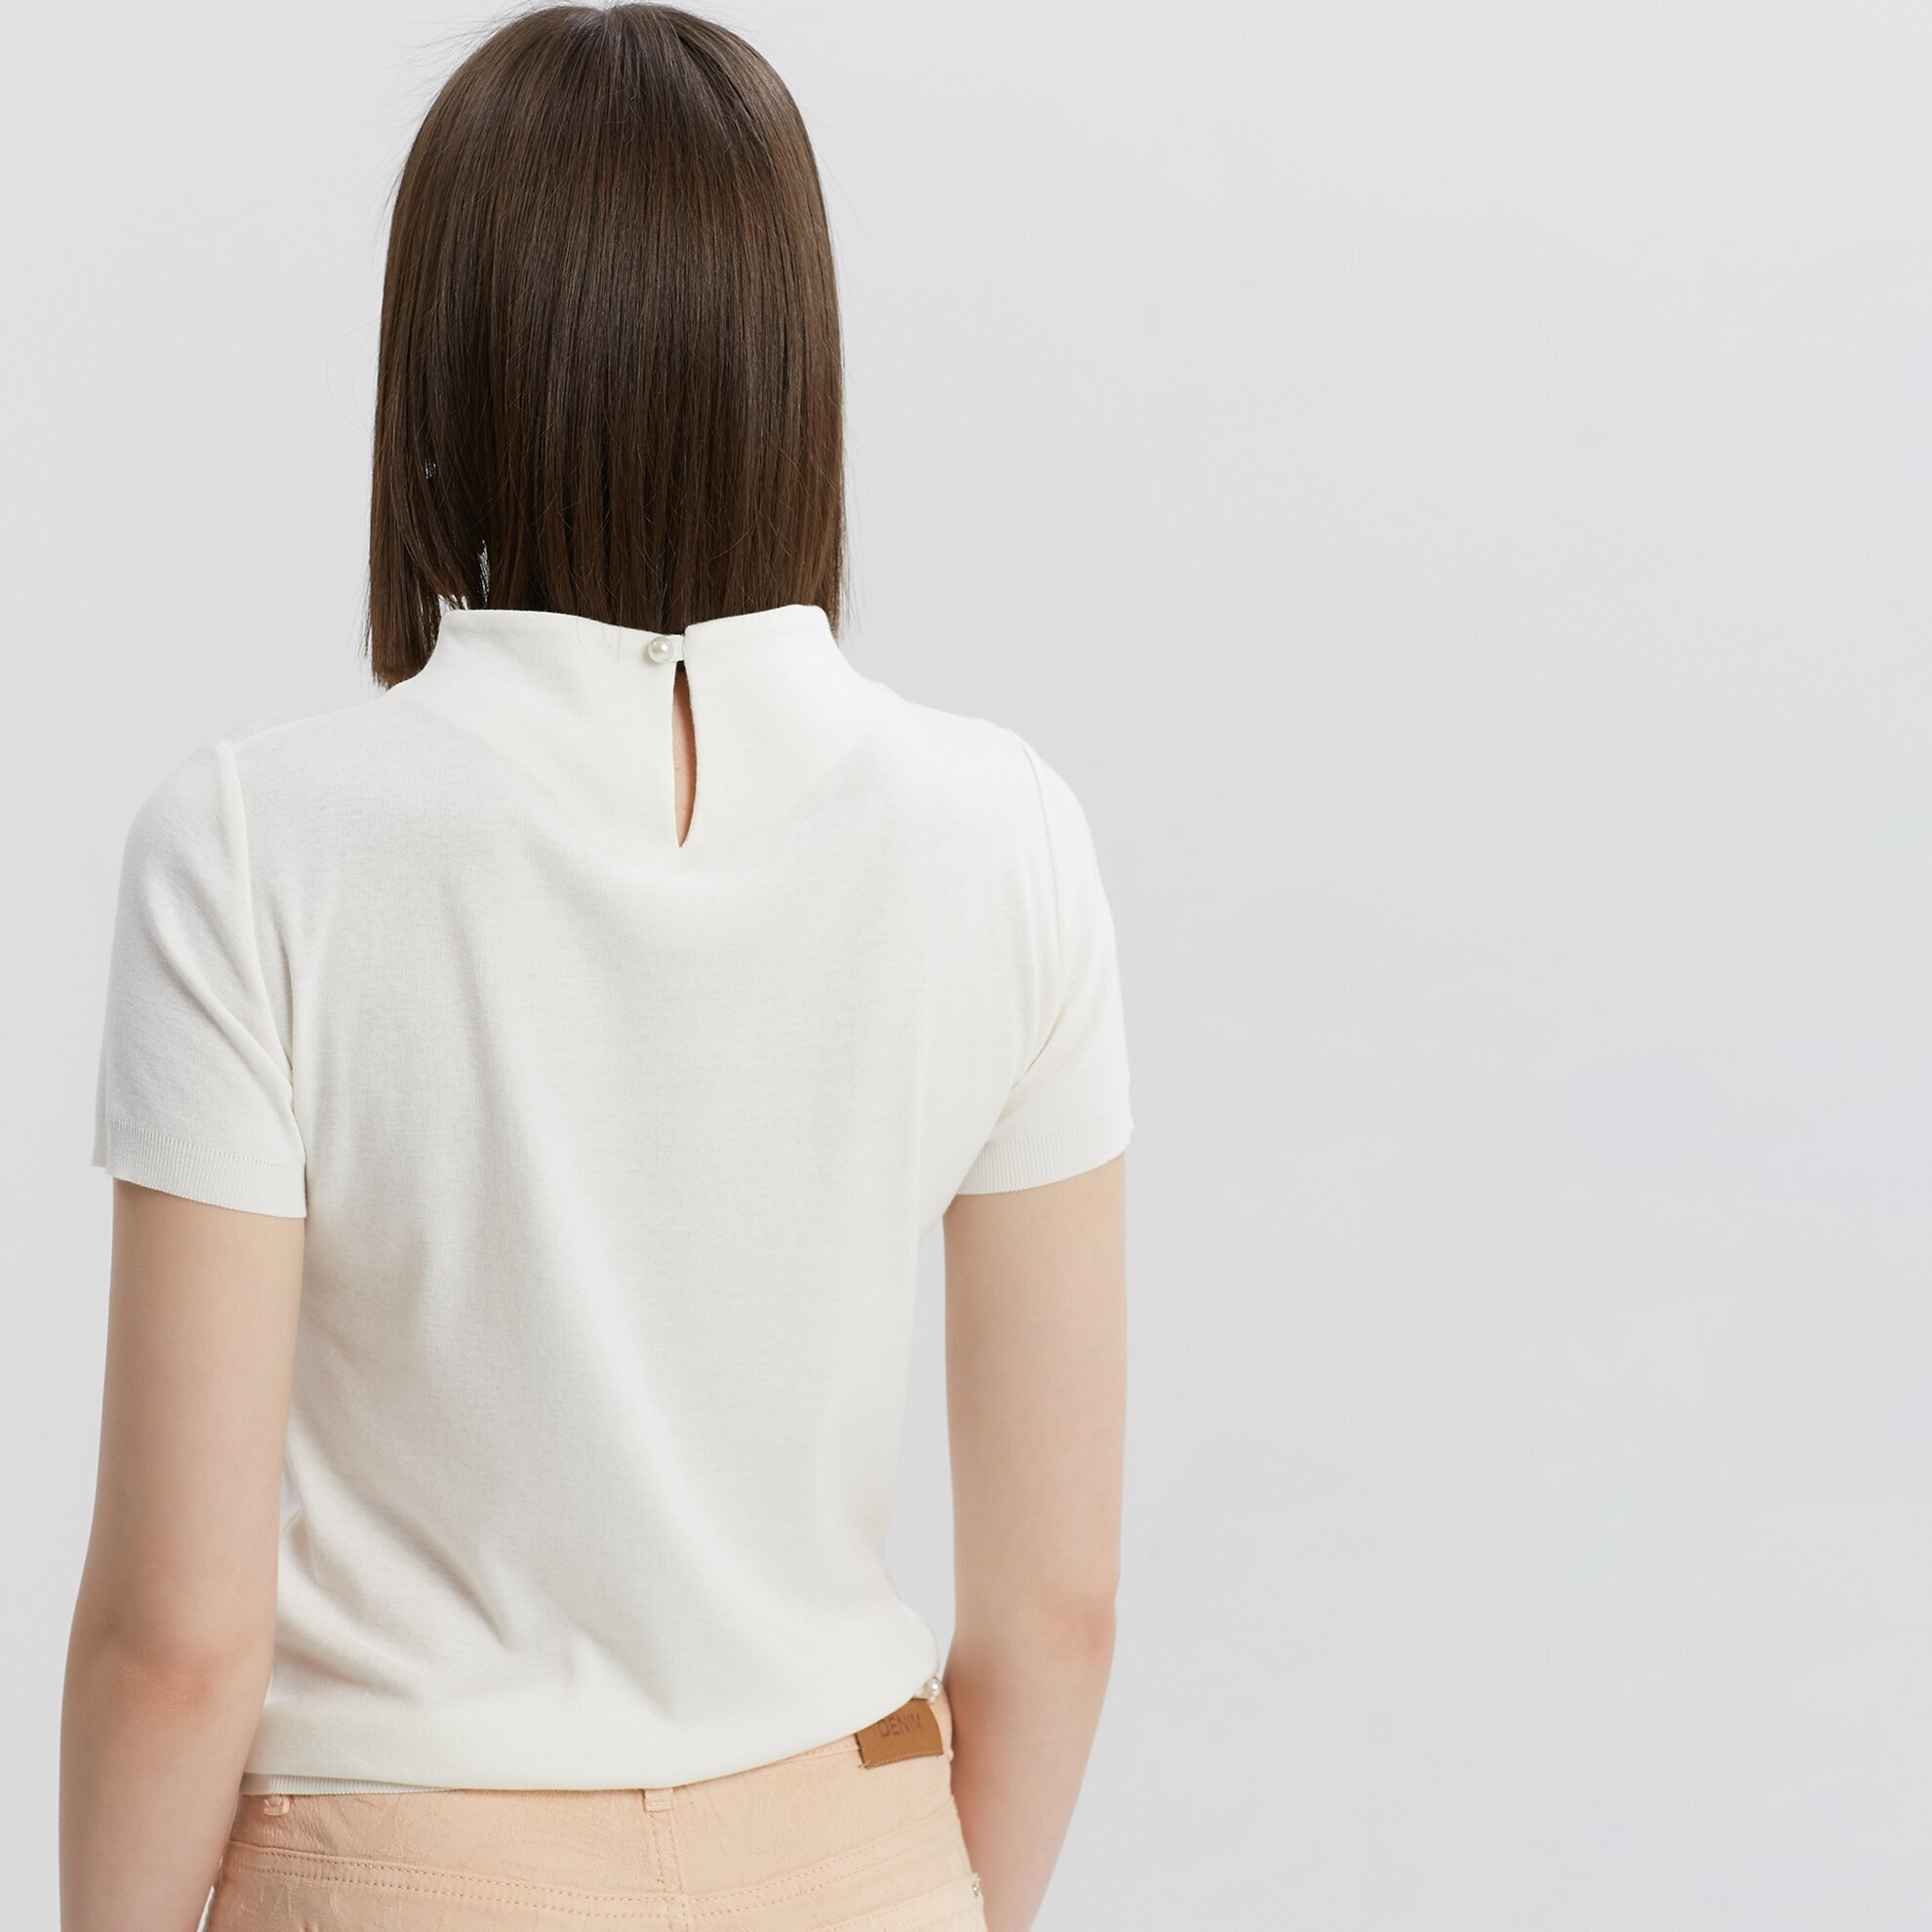 Swan Neck Print Detailed Knitwear